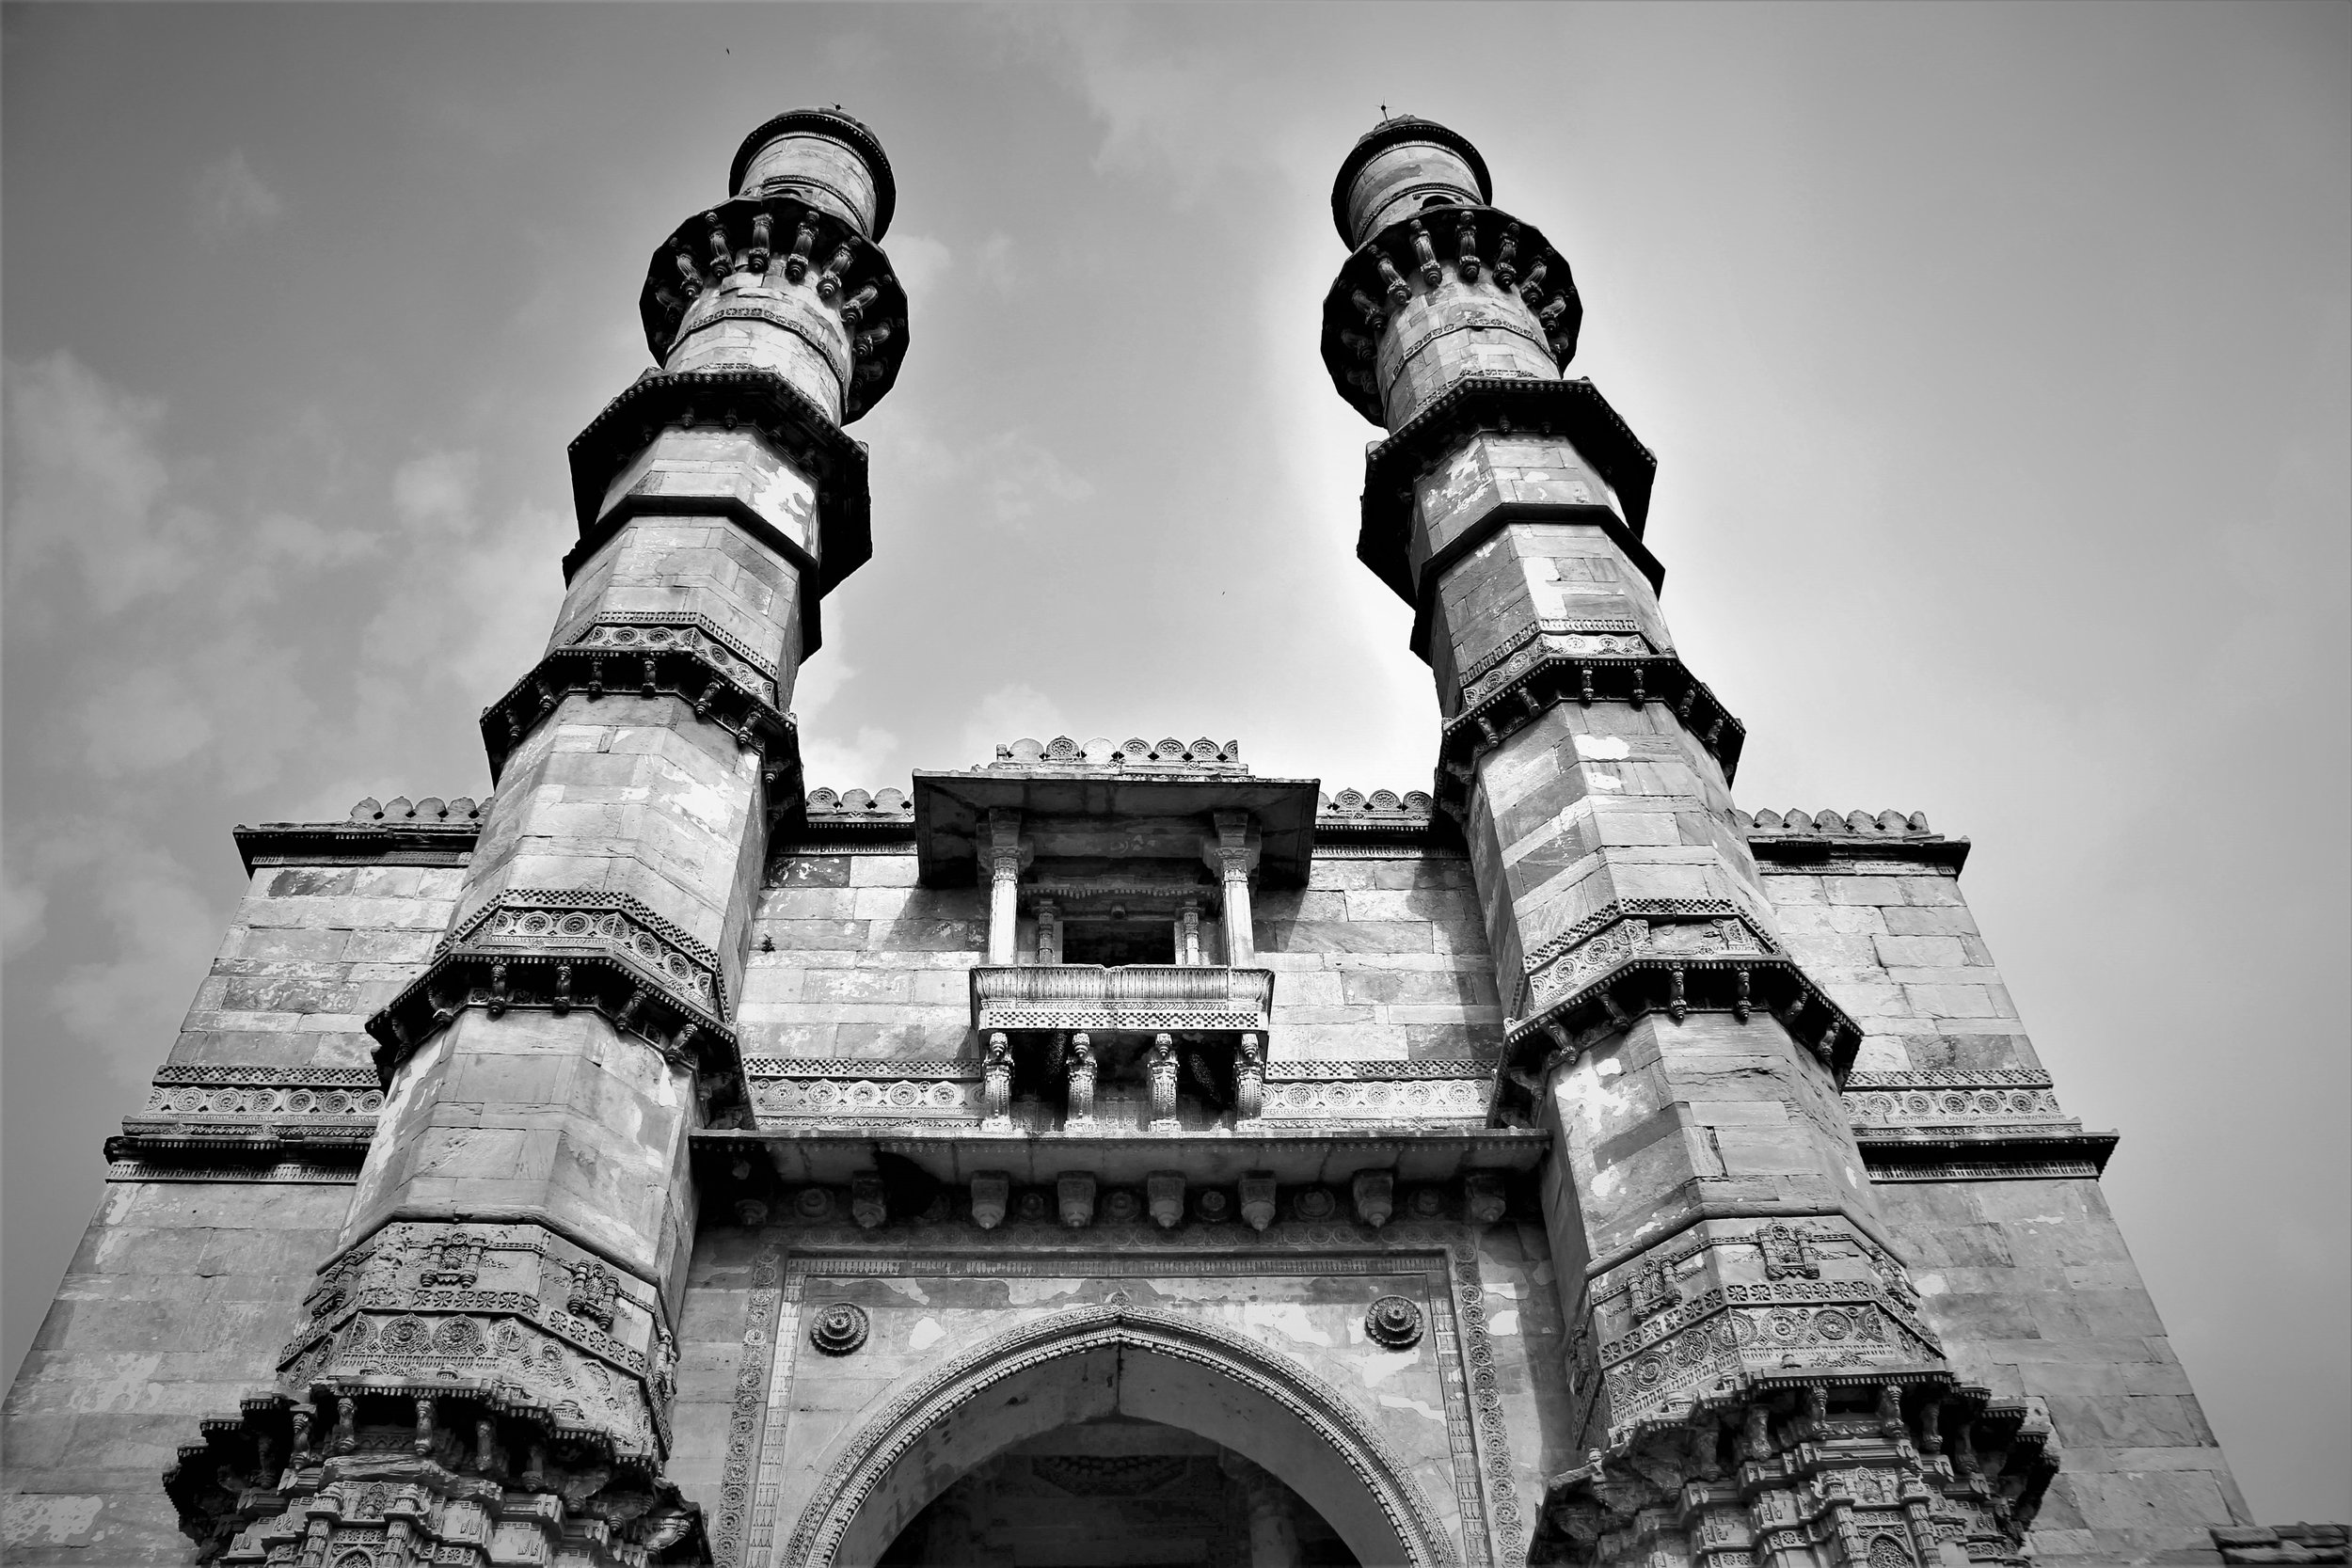 ancient-antique-architecture-672638.jpg